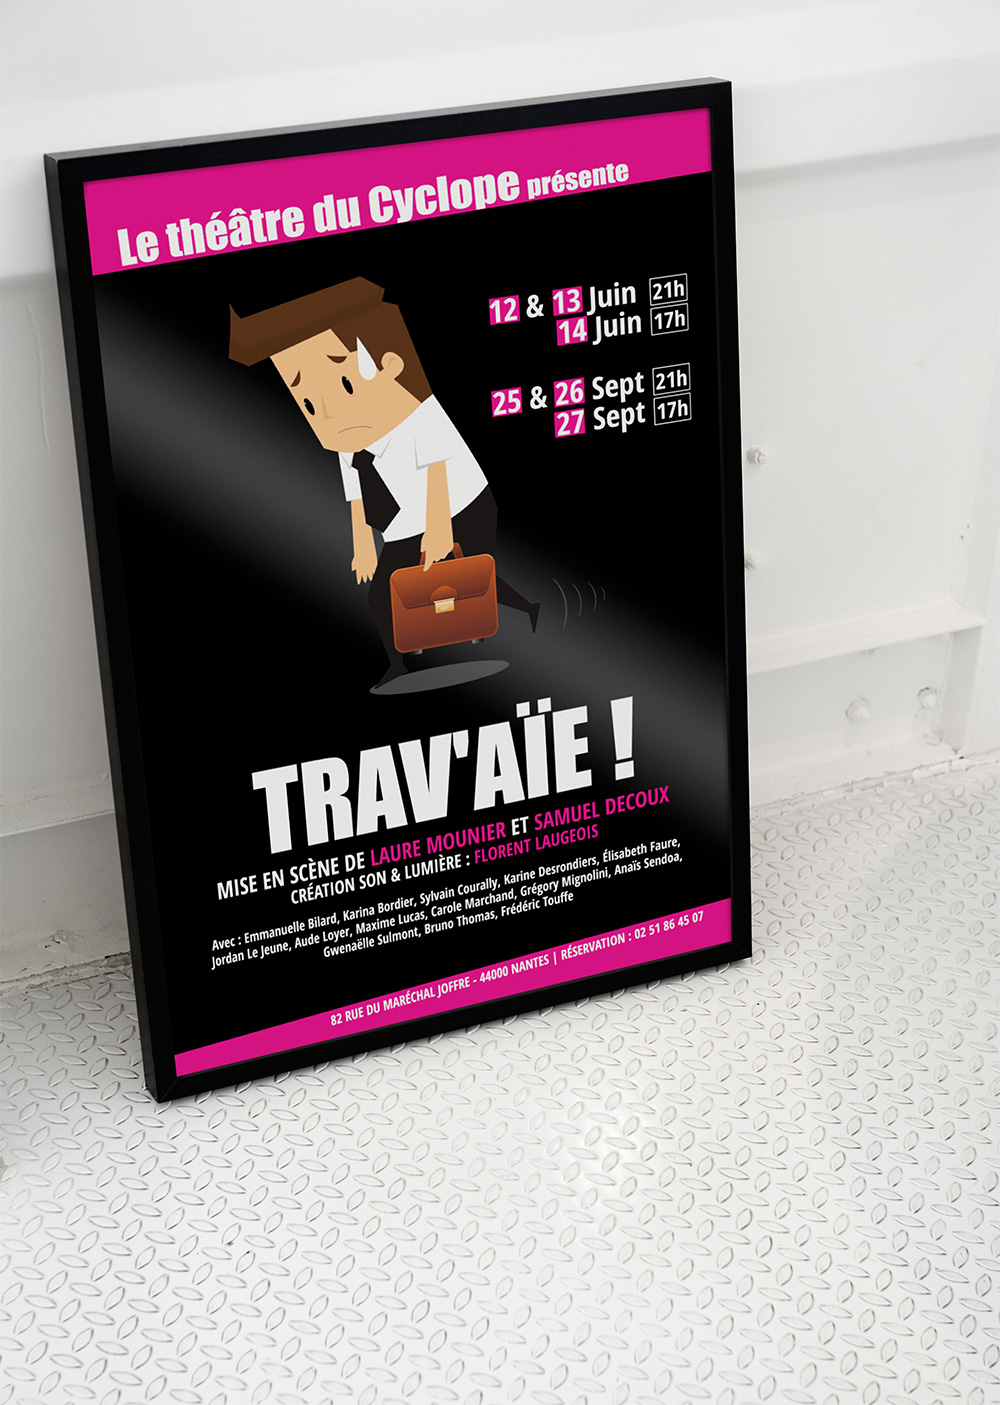 cyclope-theatre-affiche-travaie